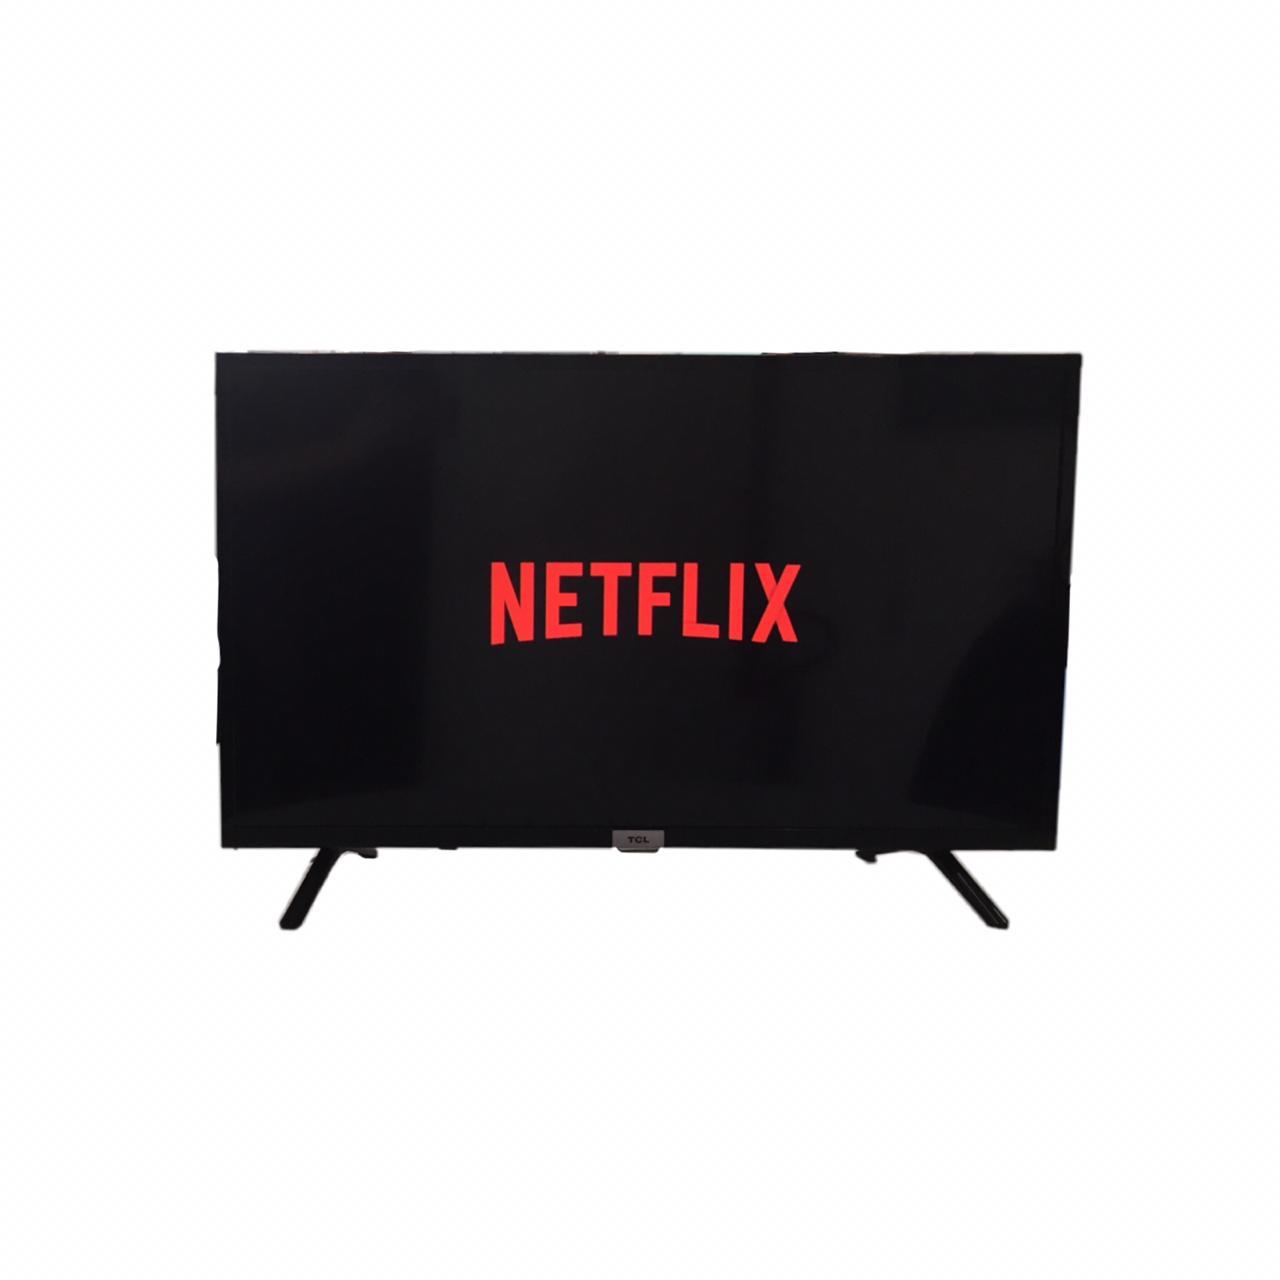 "Smart TV LED 32"" SEMP TCL 32S6500 Android Wi-Fi - HDR Inteligência Artificial 2 HDMI USB (semi-nova com detalhe na tela)"